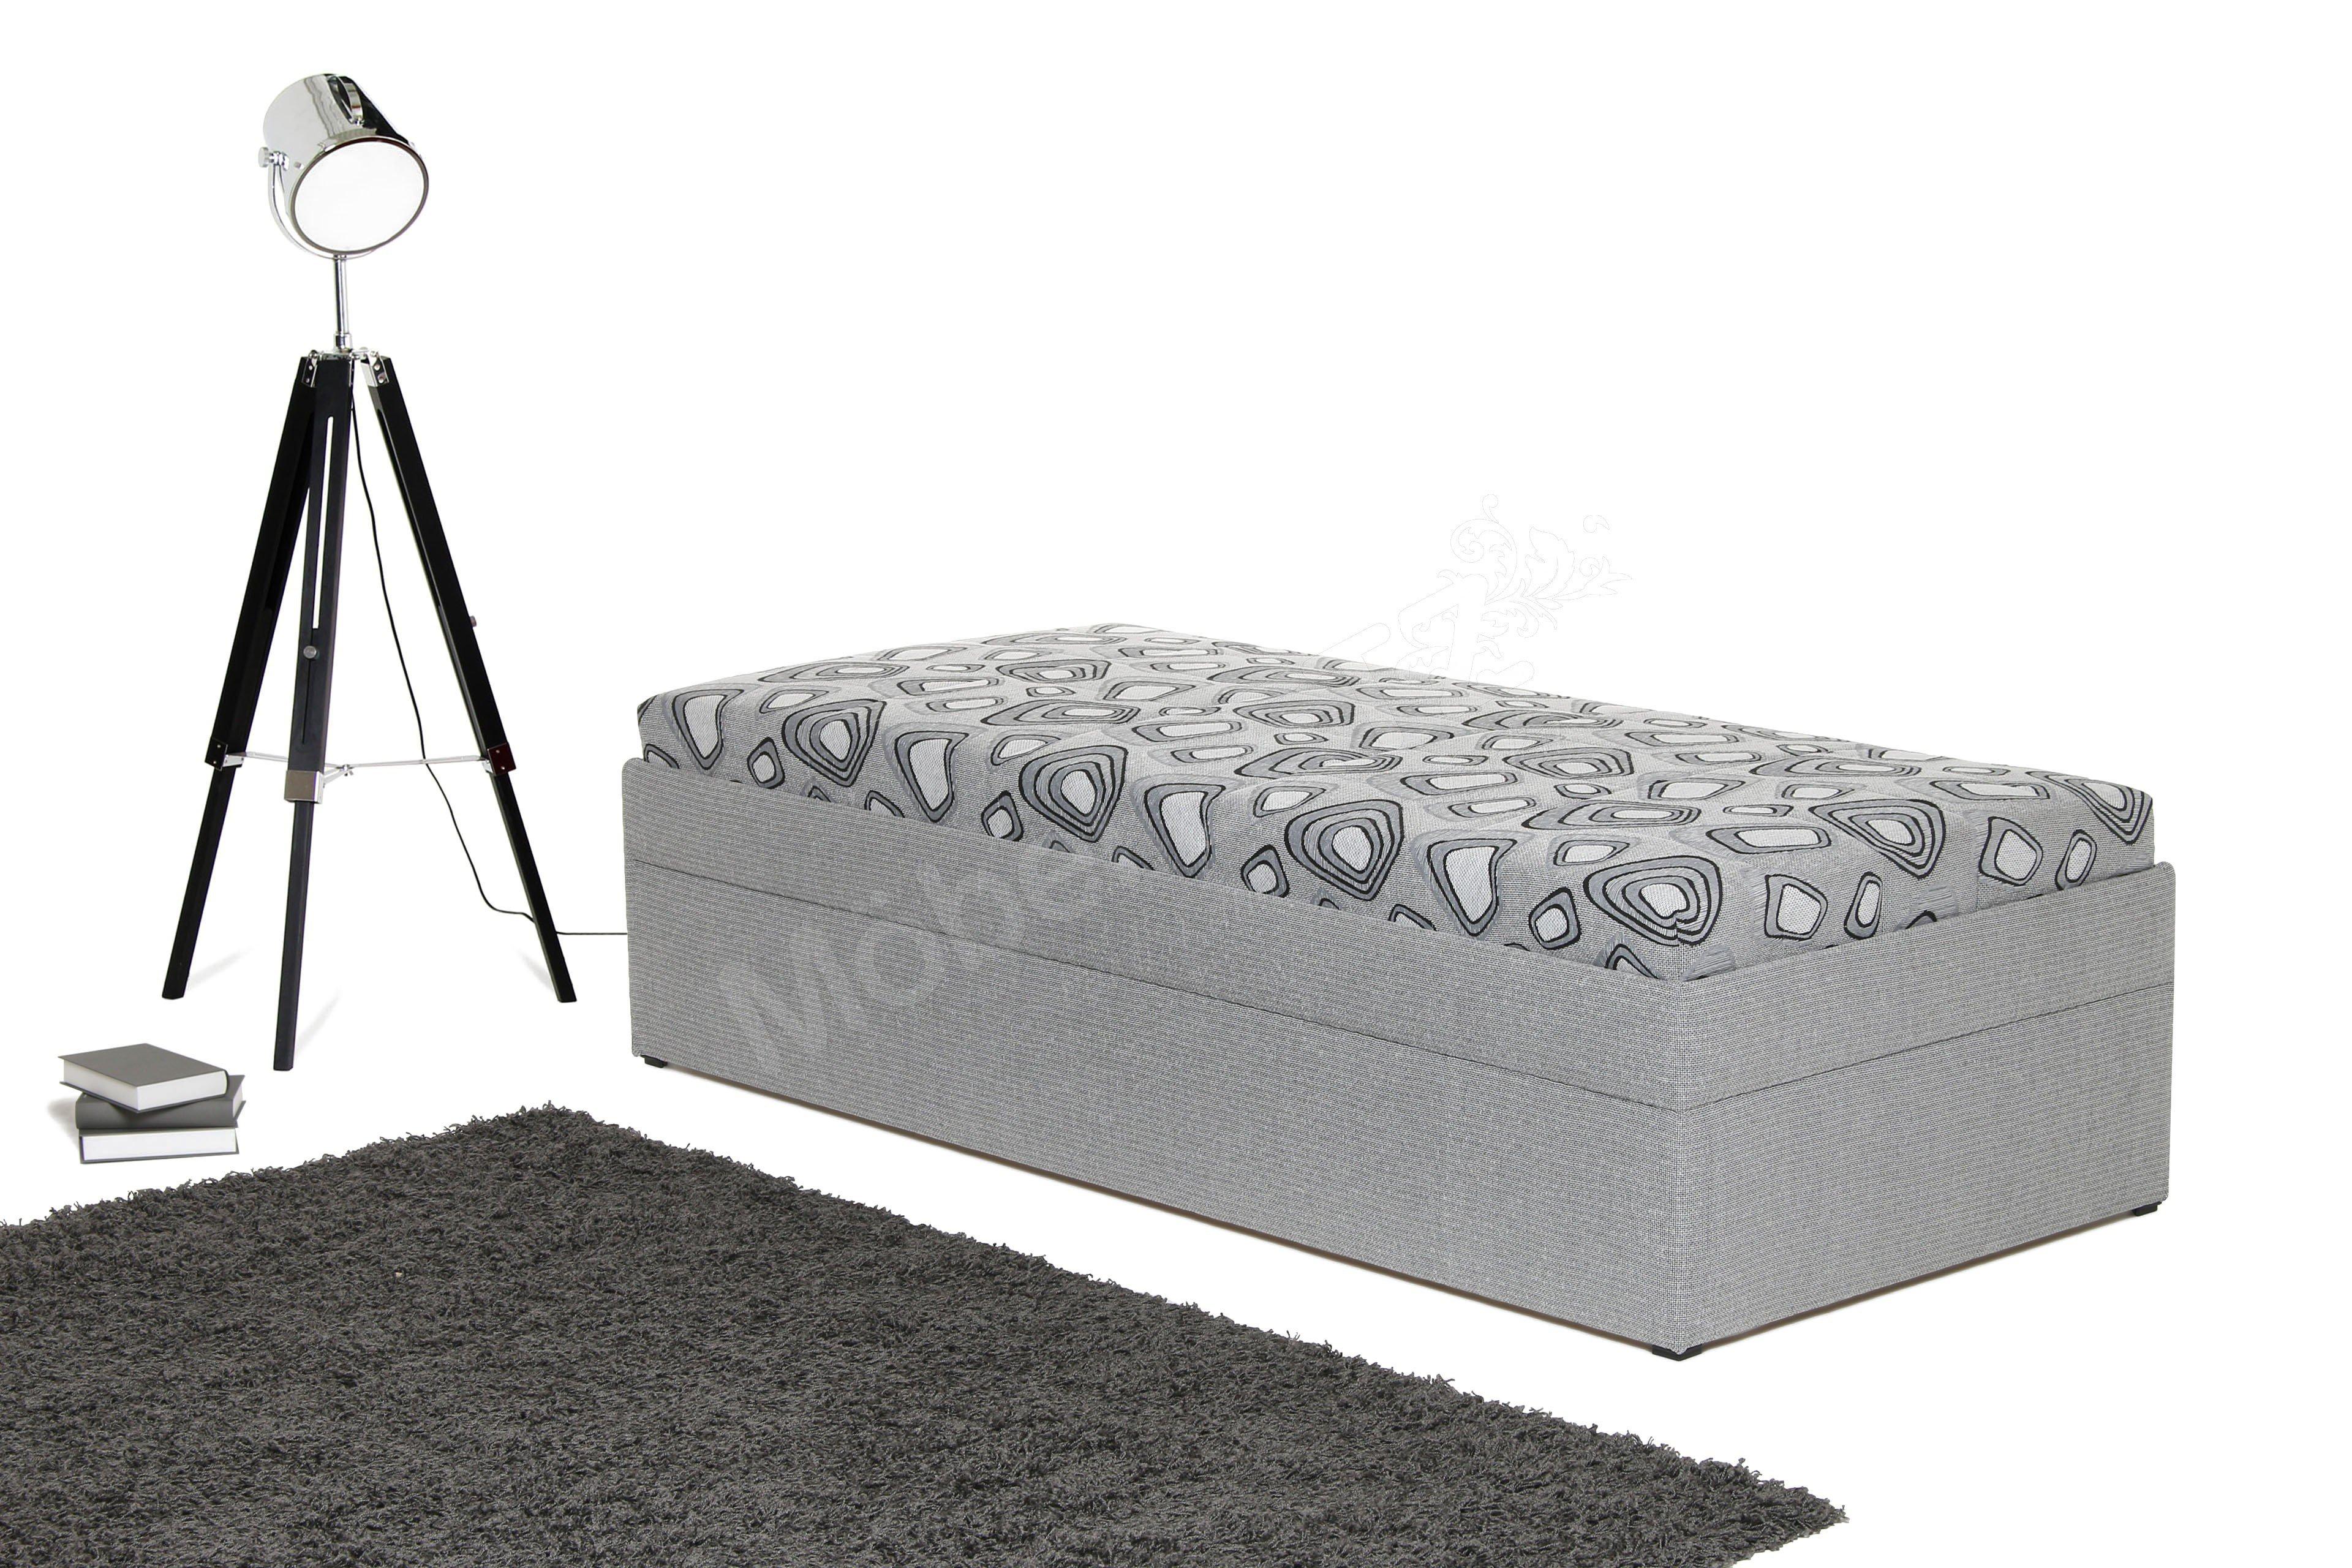 niedlich motorrahmen 48 fotos bilderrahmen ideen. Black Bedroom Furniture Sets. Home Design Ideas